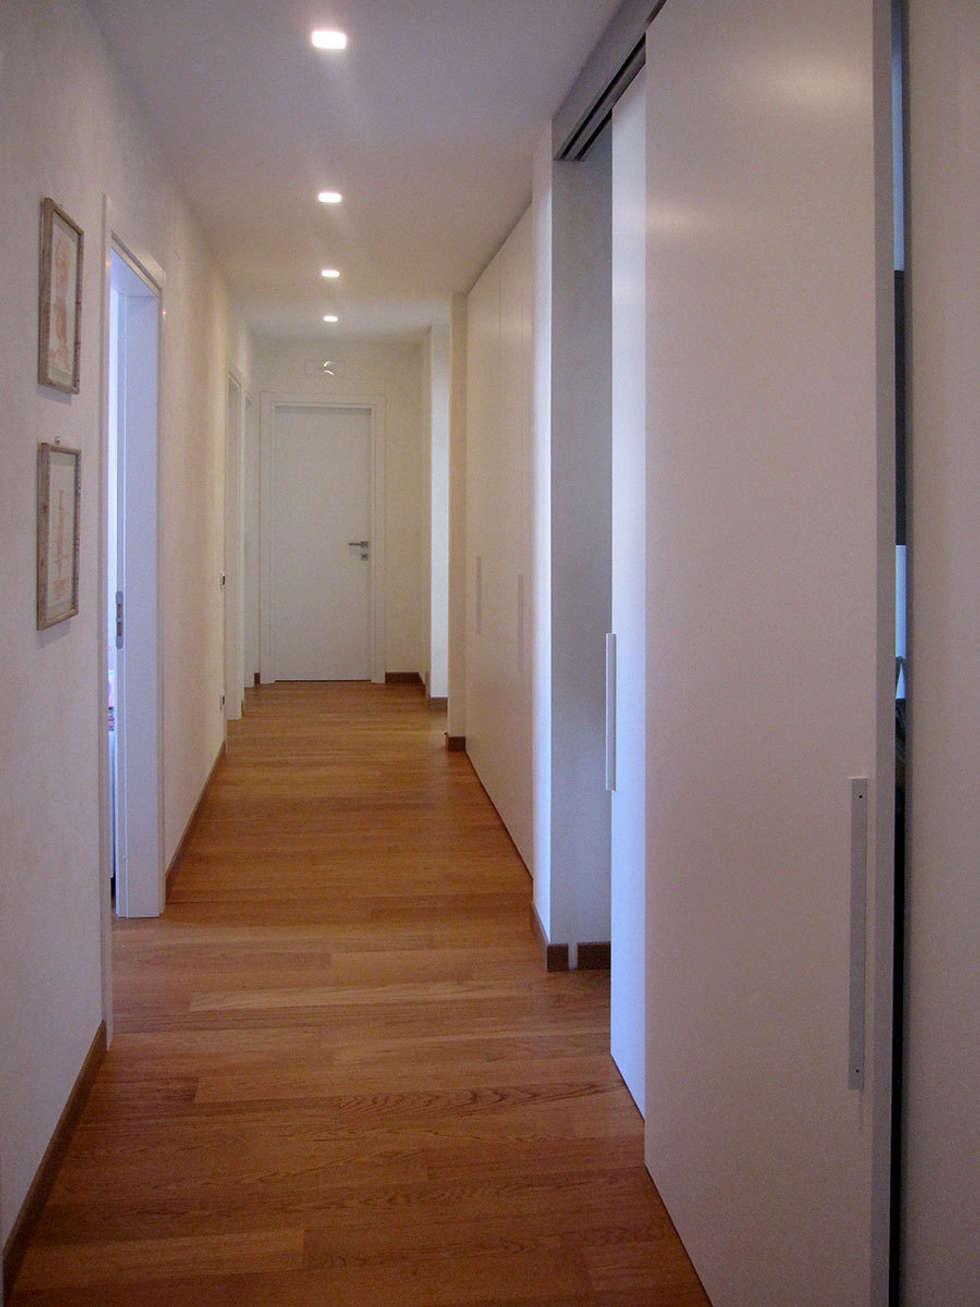 disimpegno zona notte: Ingresso & Corridoio in stile  di studio radicediuno